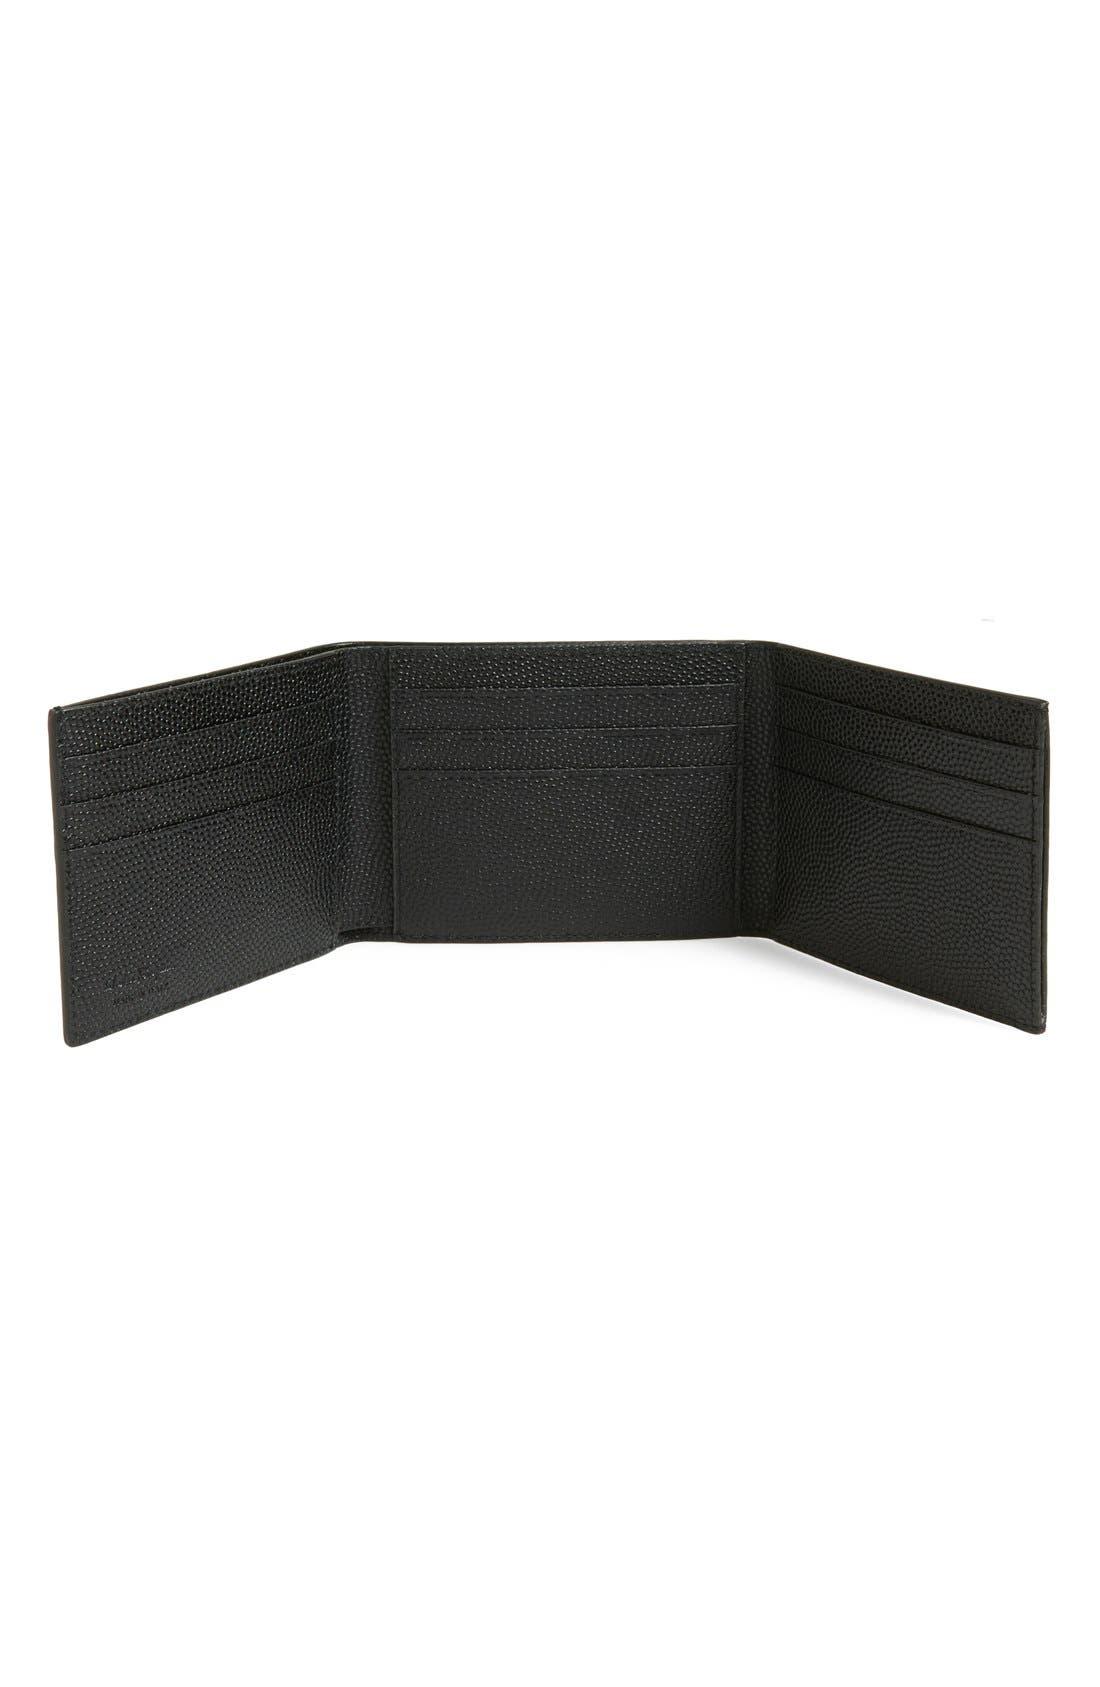 Trifold Wallet,                             Alternate thumbnail 4, color,